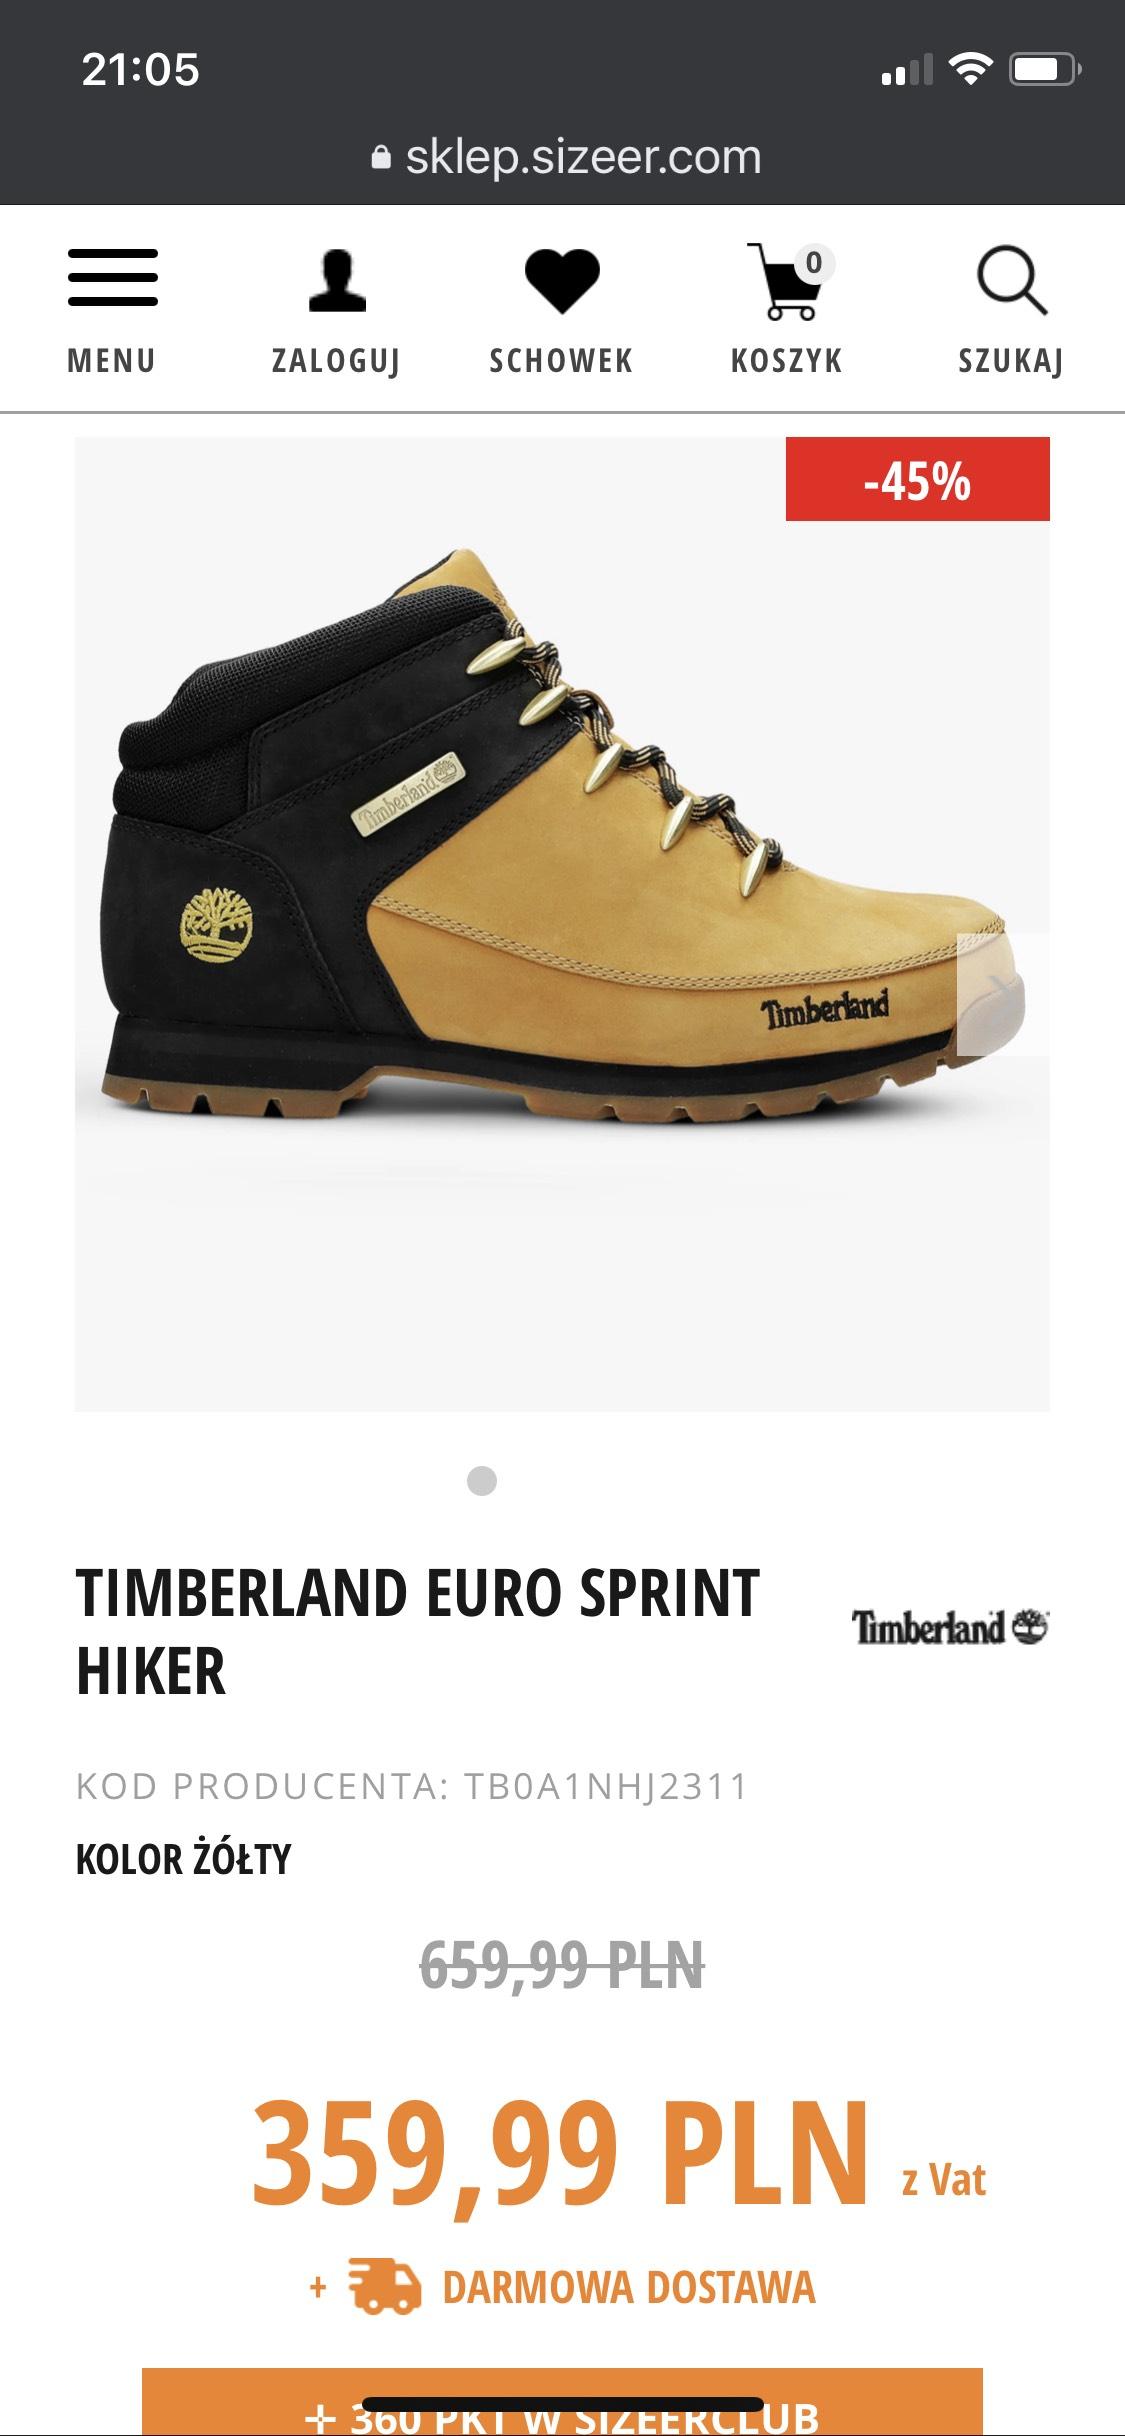 Timberland euro sprint hiker